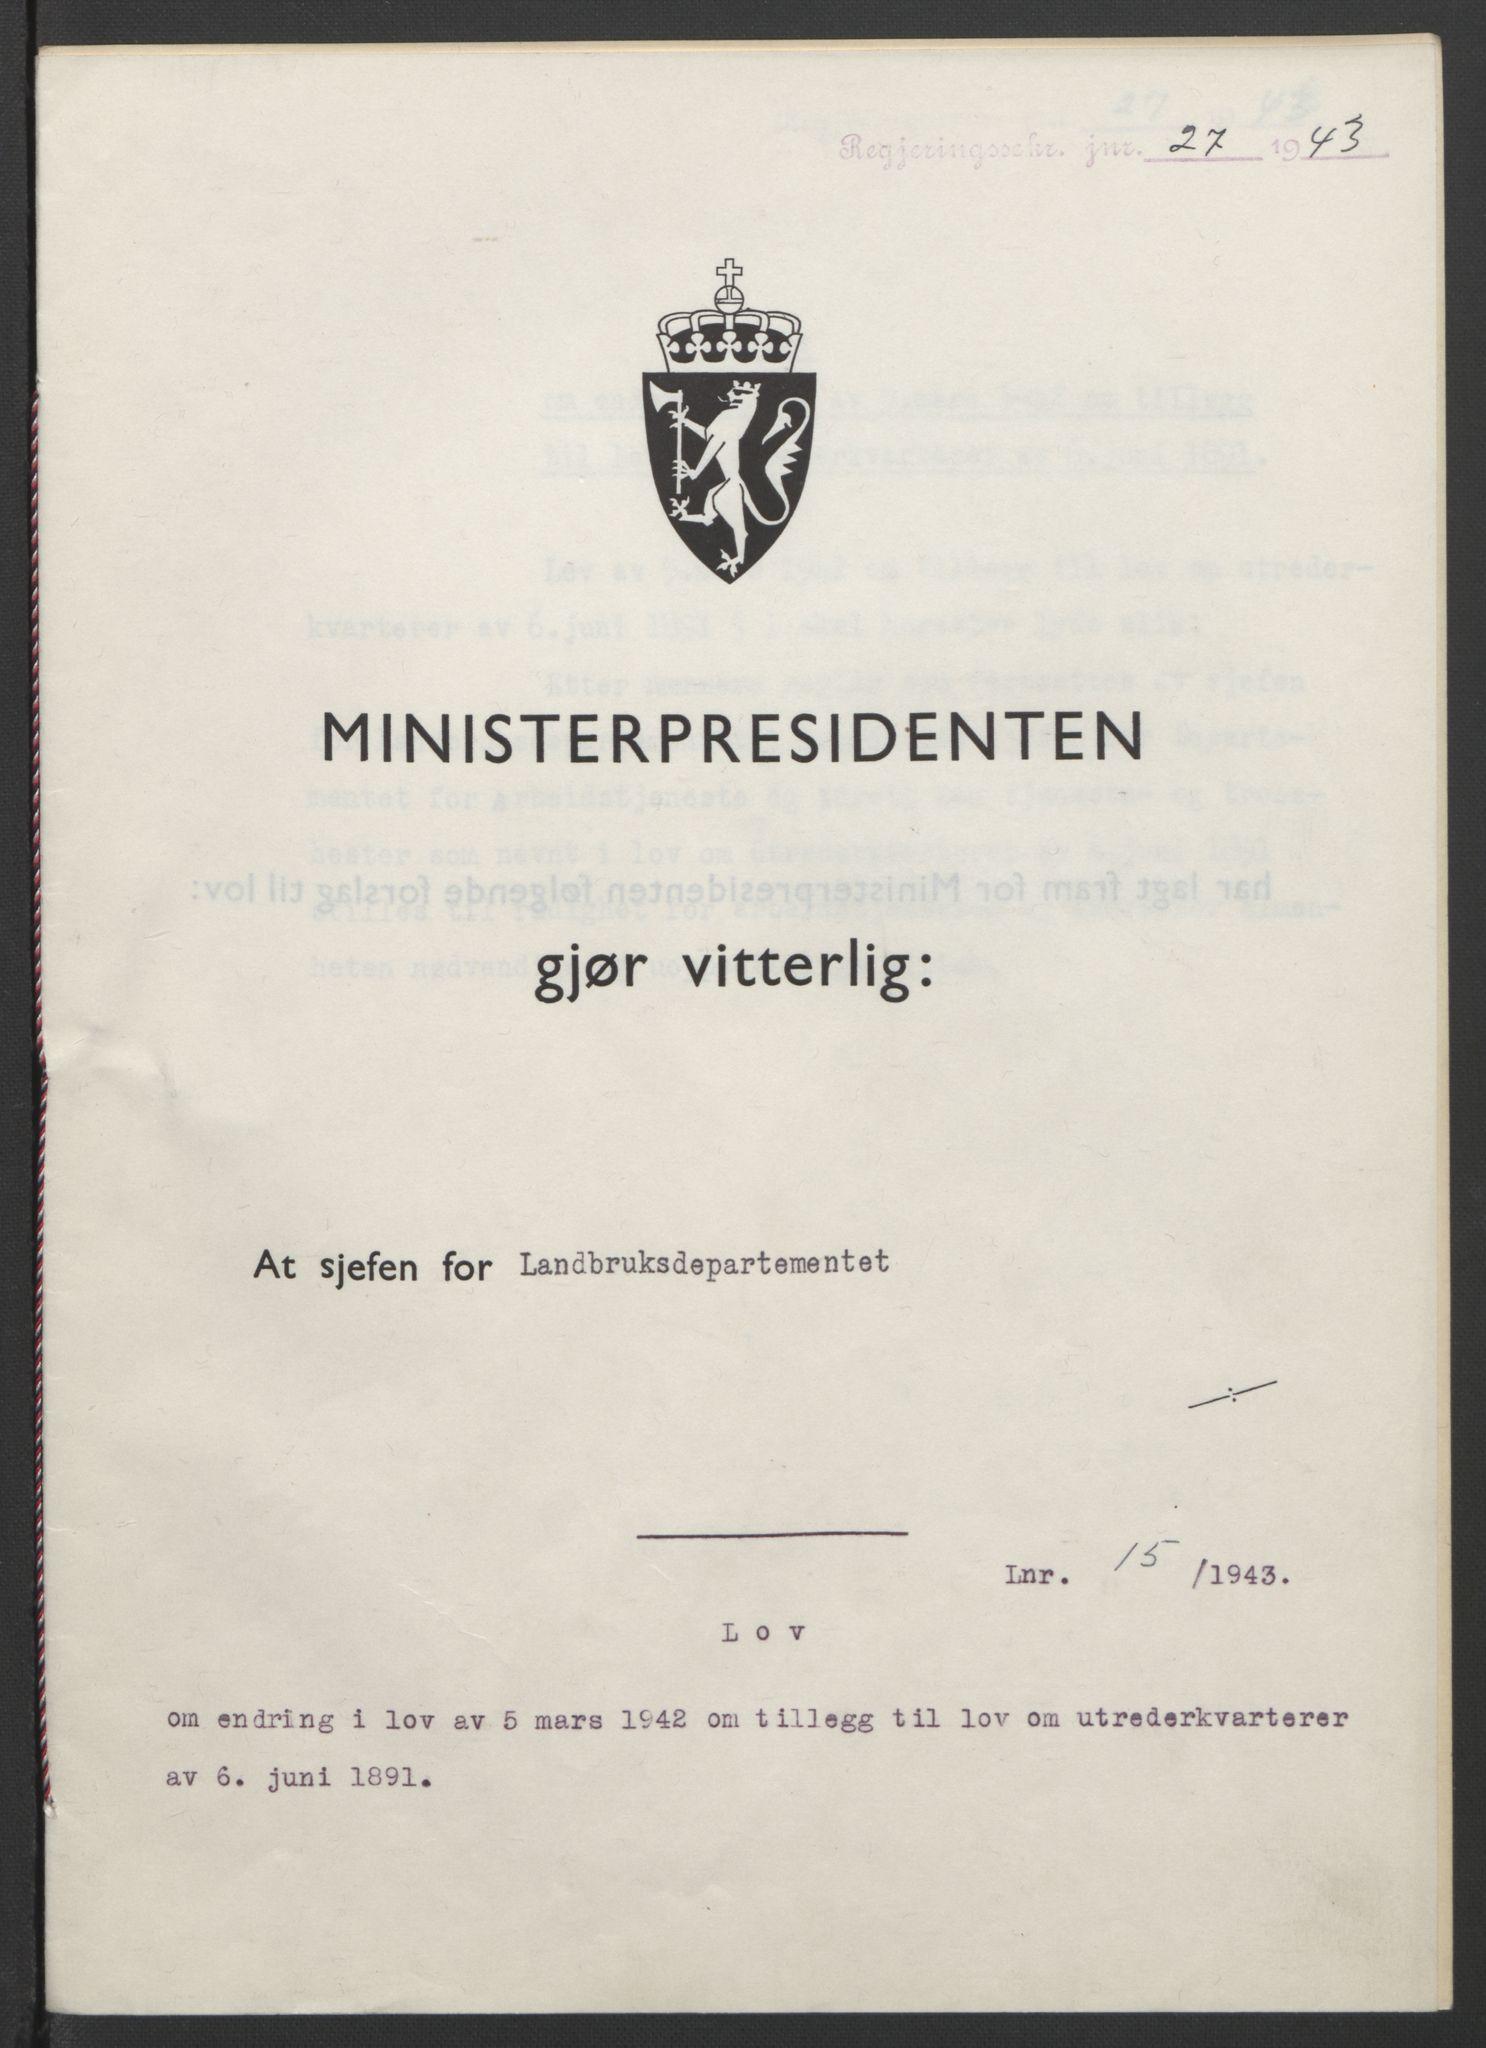 RA, NS-administrasjonen 1940-1945 (Statsrådsekretariatet, de kommisariske statsråder mm), D/Db/L0099: Lover, 1943, s. 59